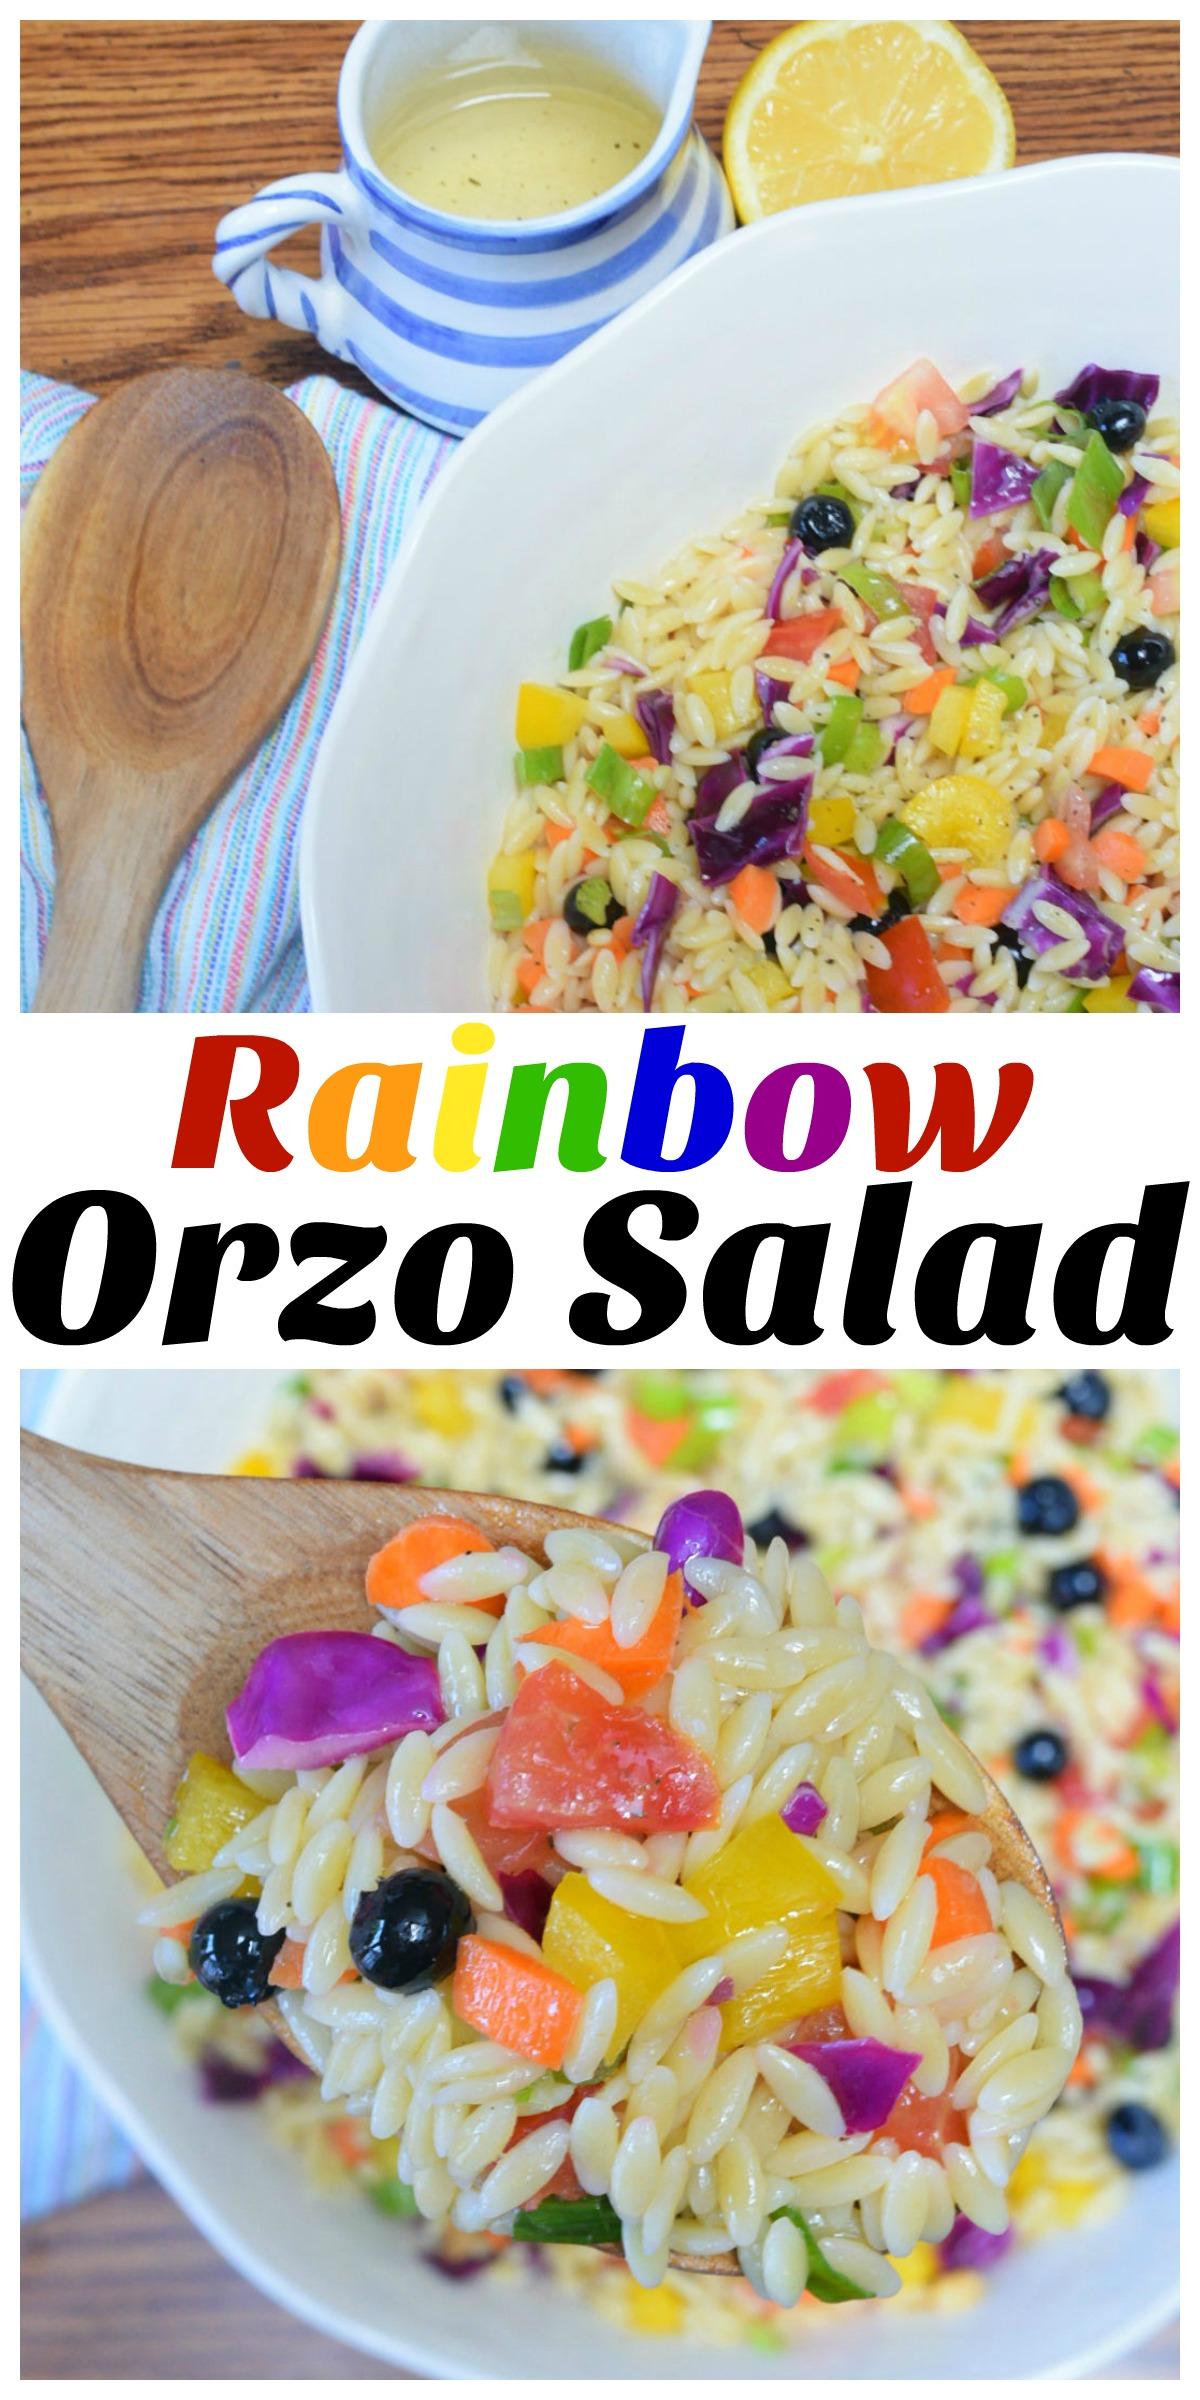 Rainbow Orzo Salad Collage